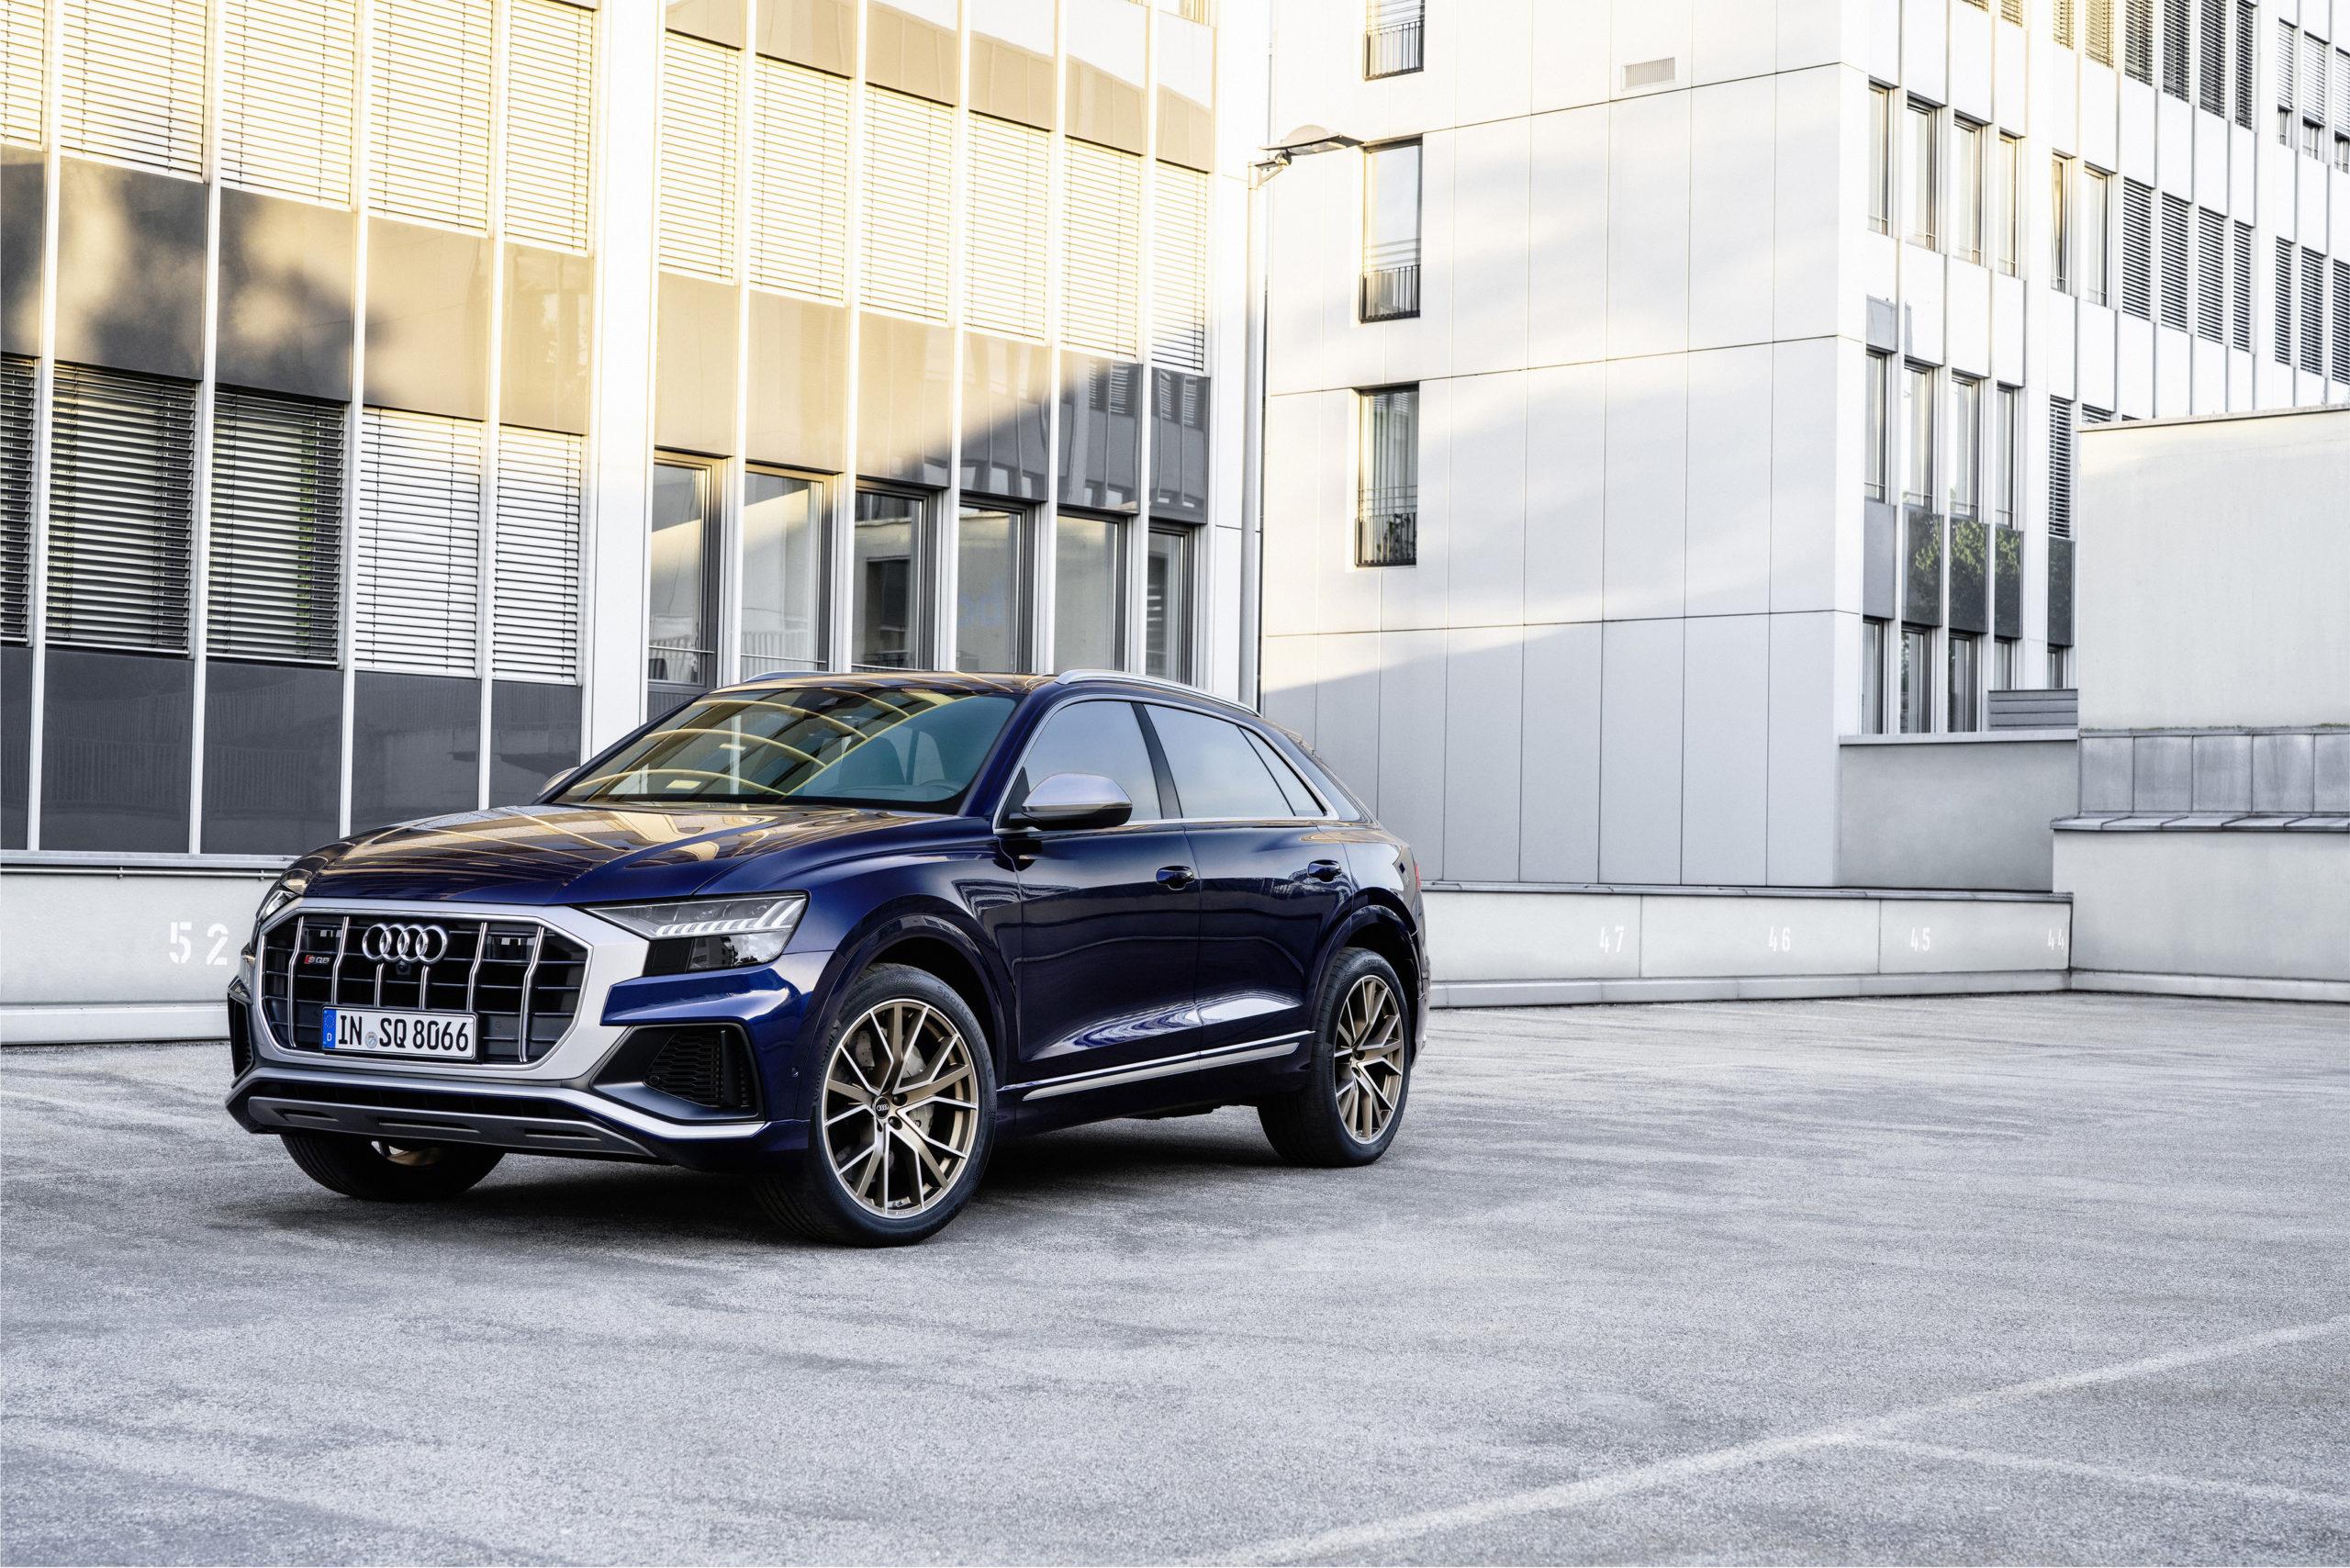 2021 Audi SQ8 TFSI